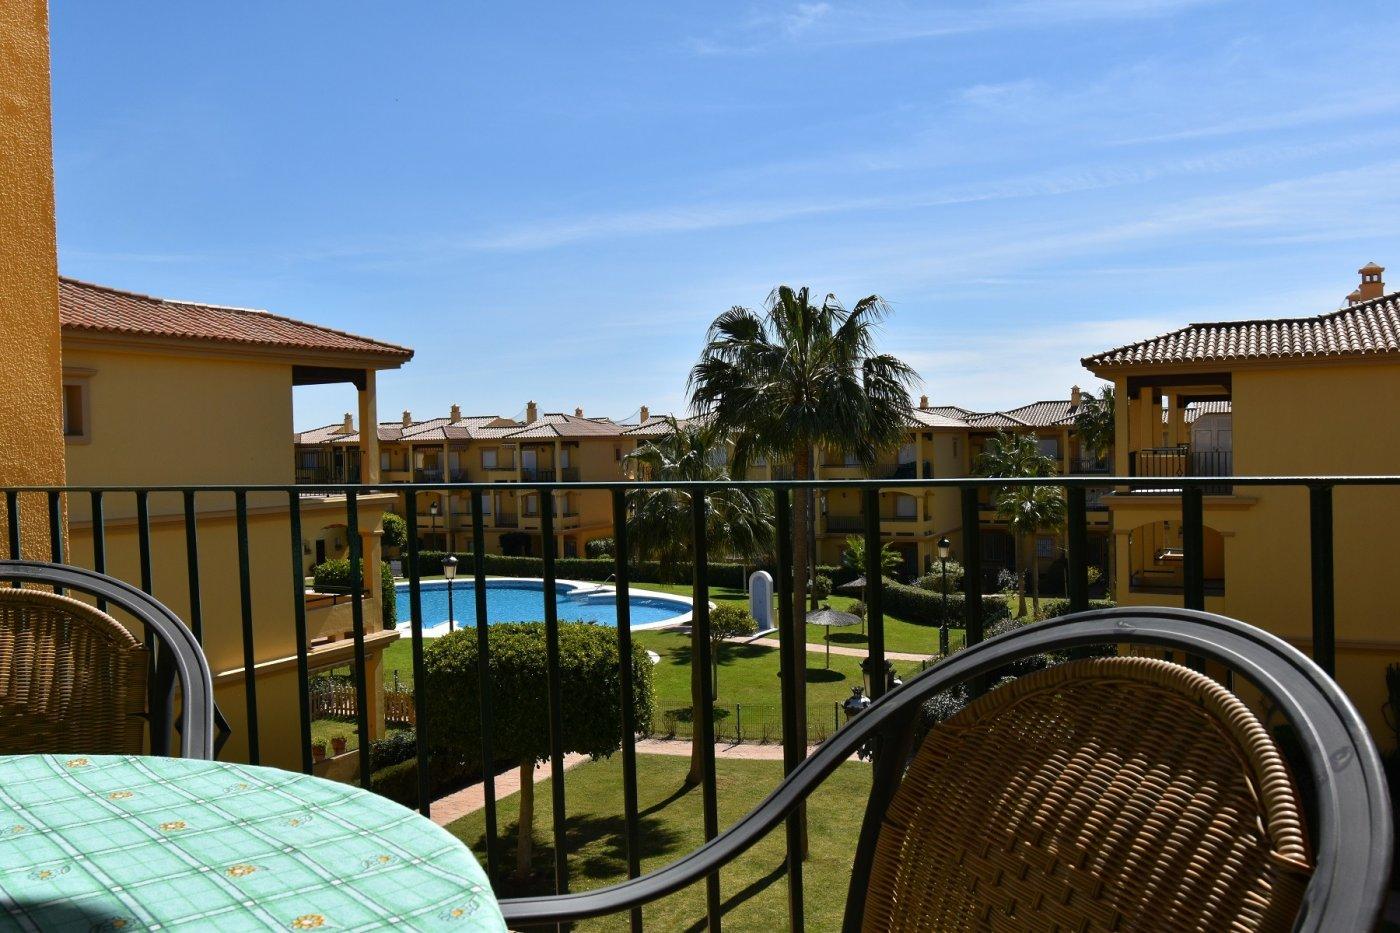 apartamento en chiclana-de-la-frontera · novo-sancti-petri 242000€